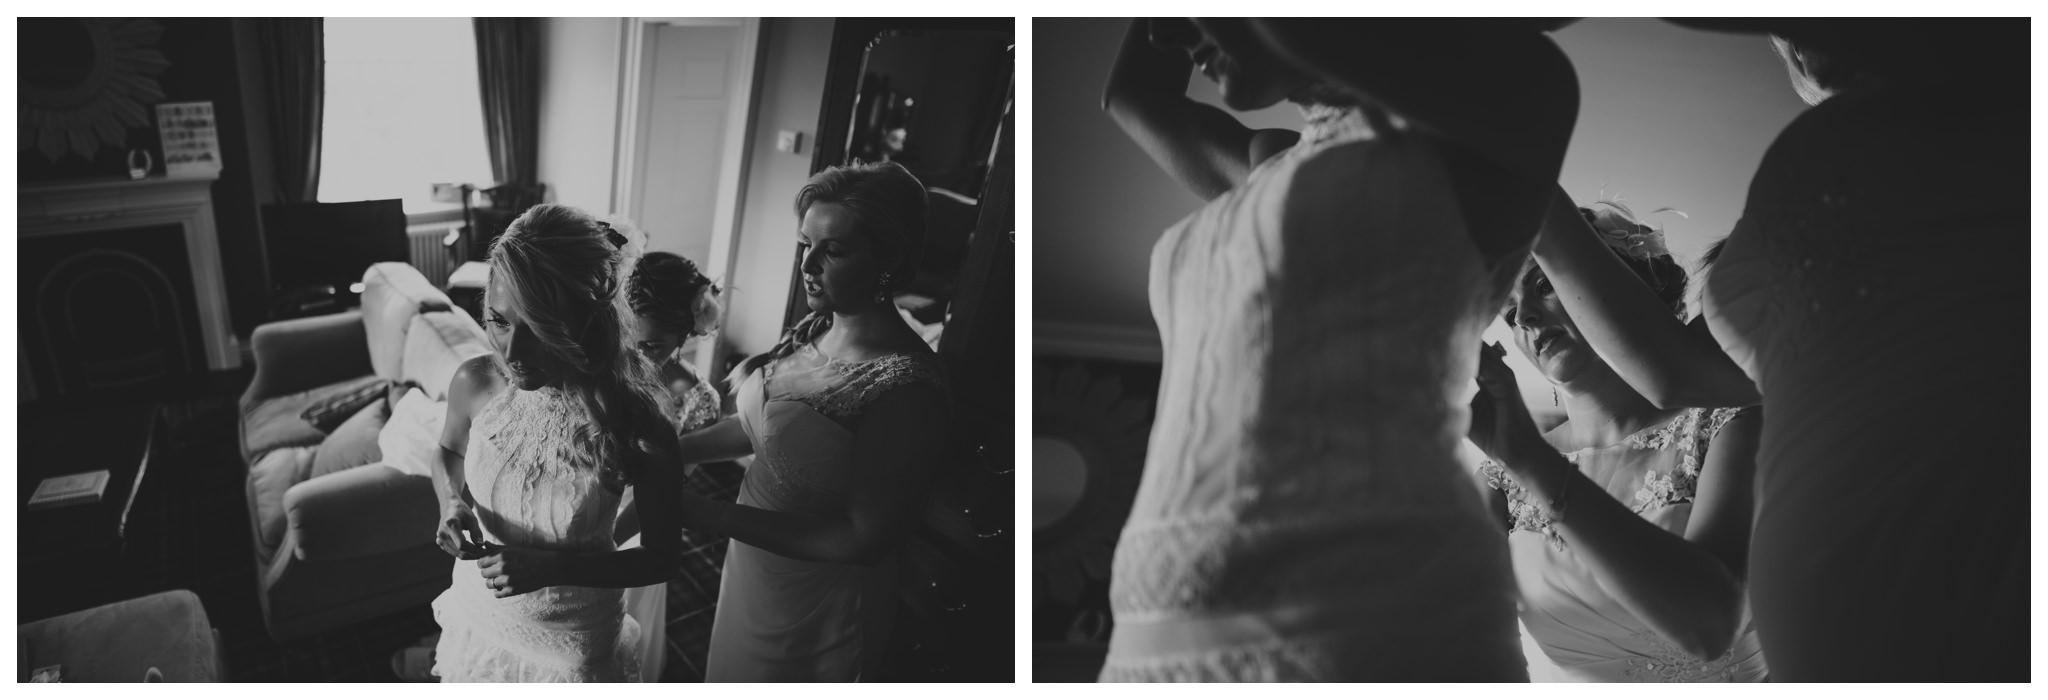 Richard Savage Photography - Wedding - Peterstone Court Brecon - 2016-05-11_0013